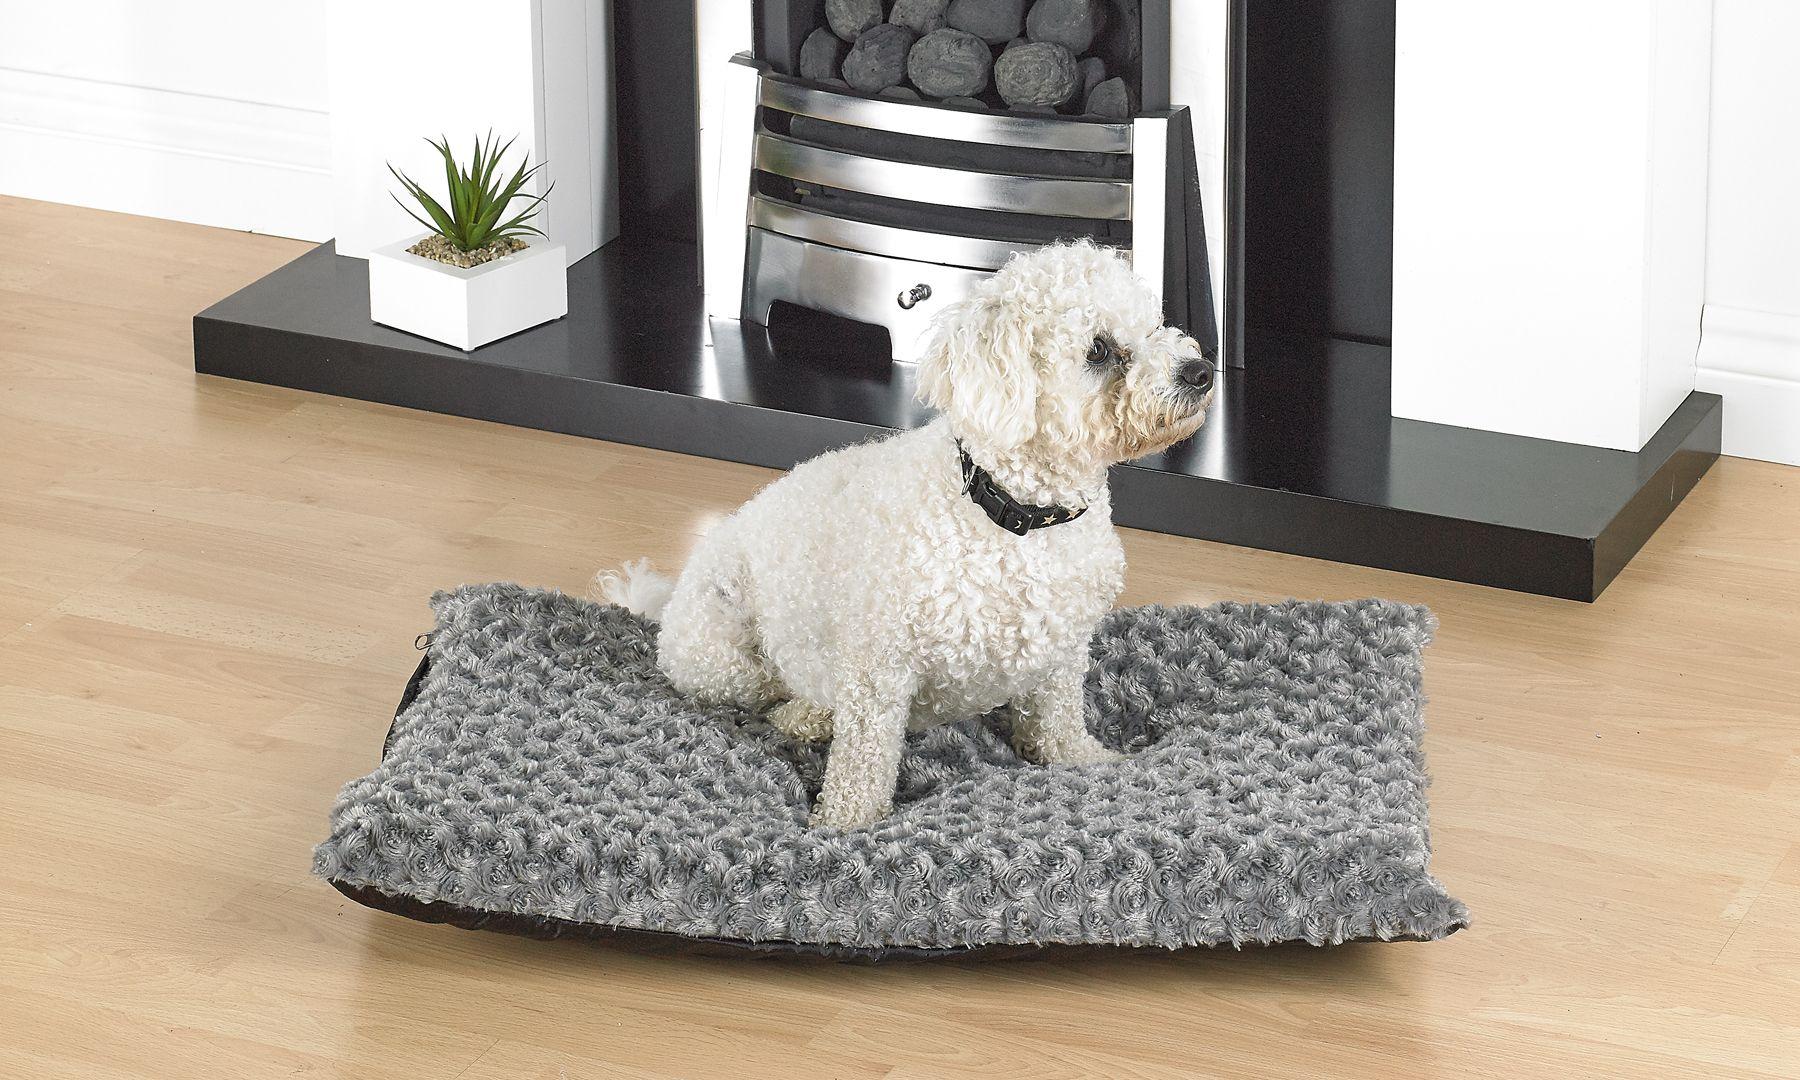 Washable Rose Fur Medium Dog Beds With Anti Slip Base In